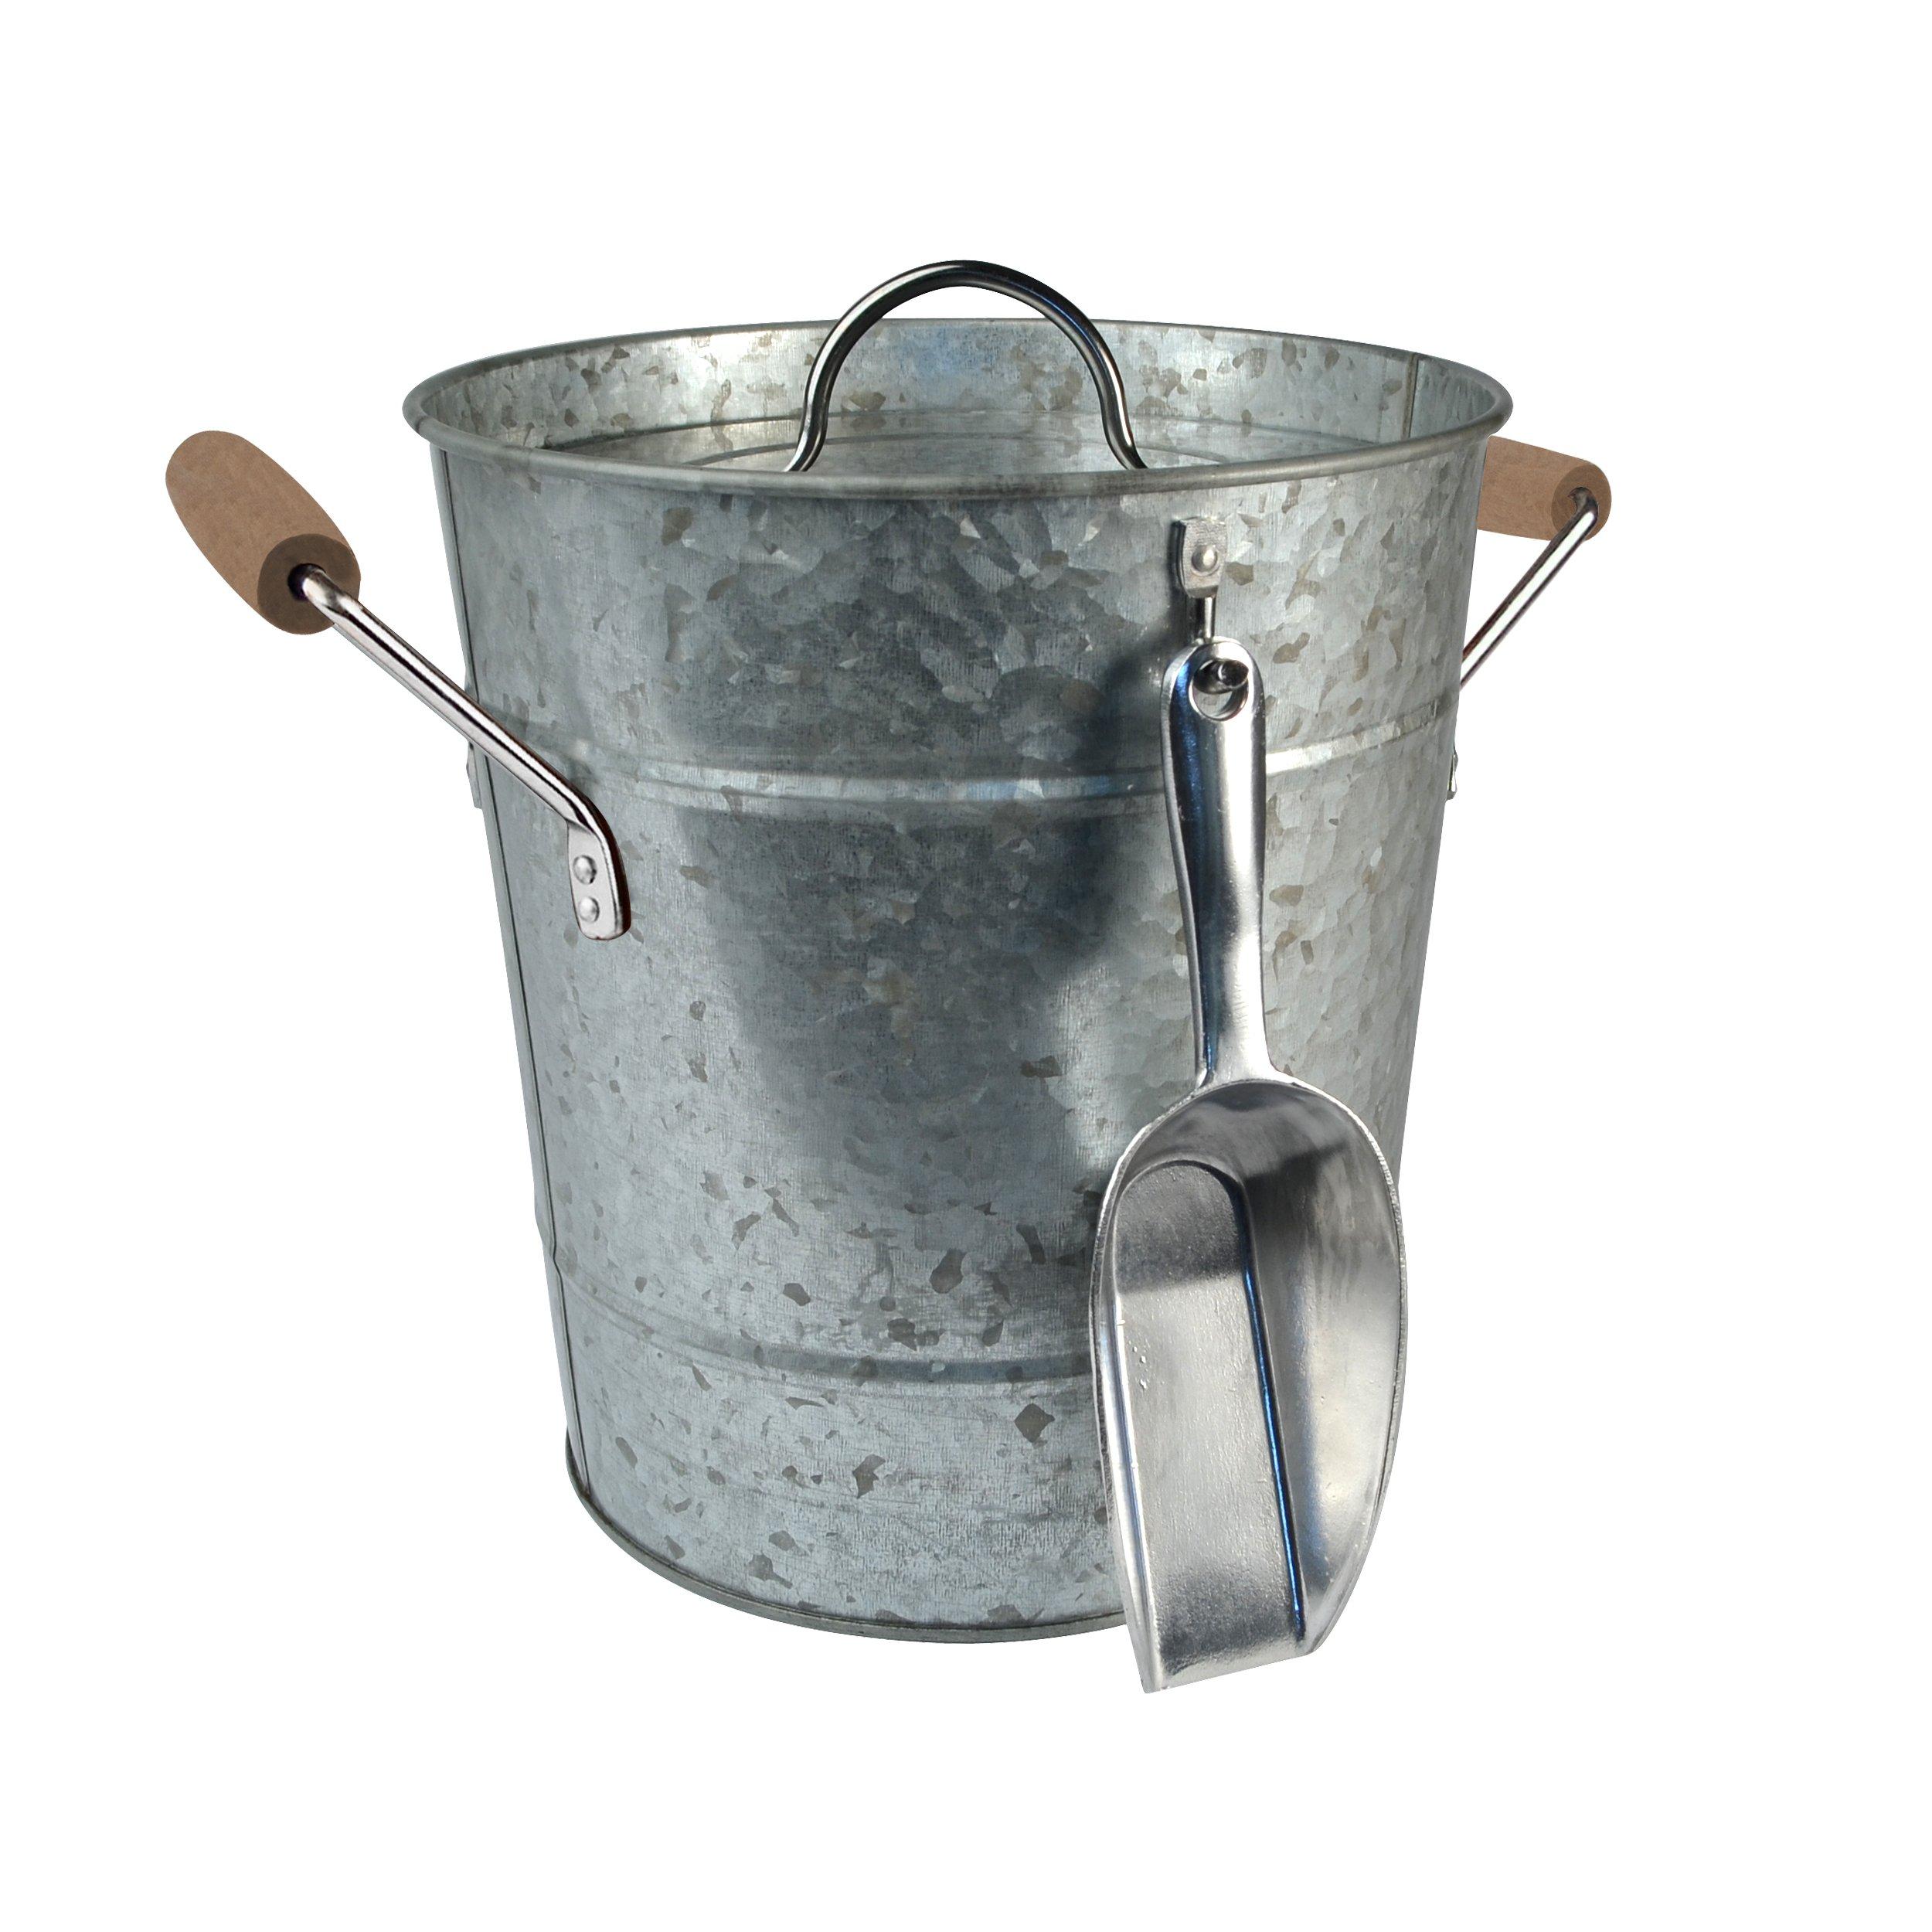 Artland Masonware Ice Bucket with Scoop, Galvanized, Metal by ARTLAND